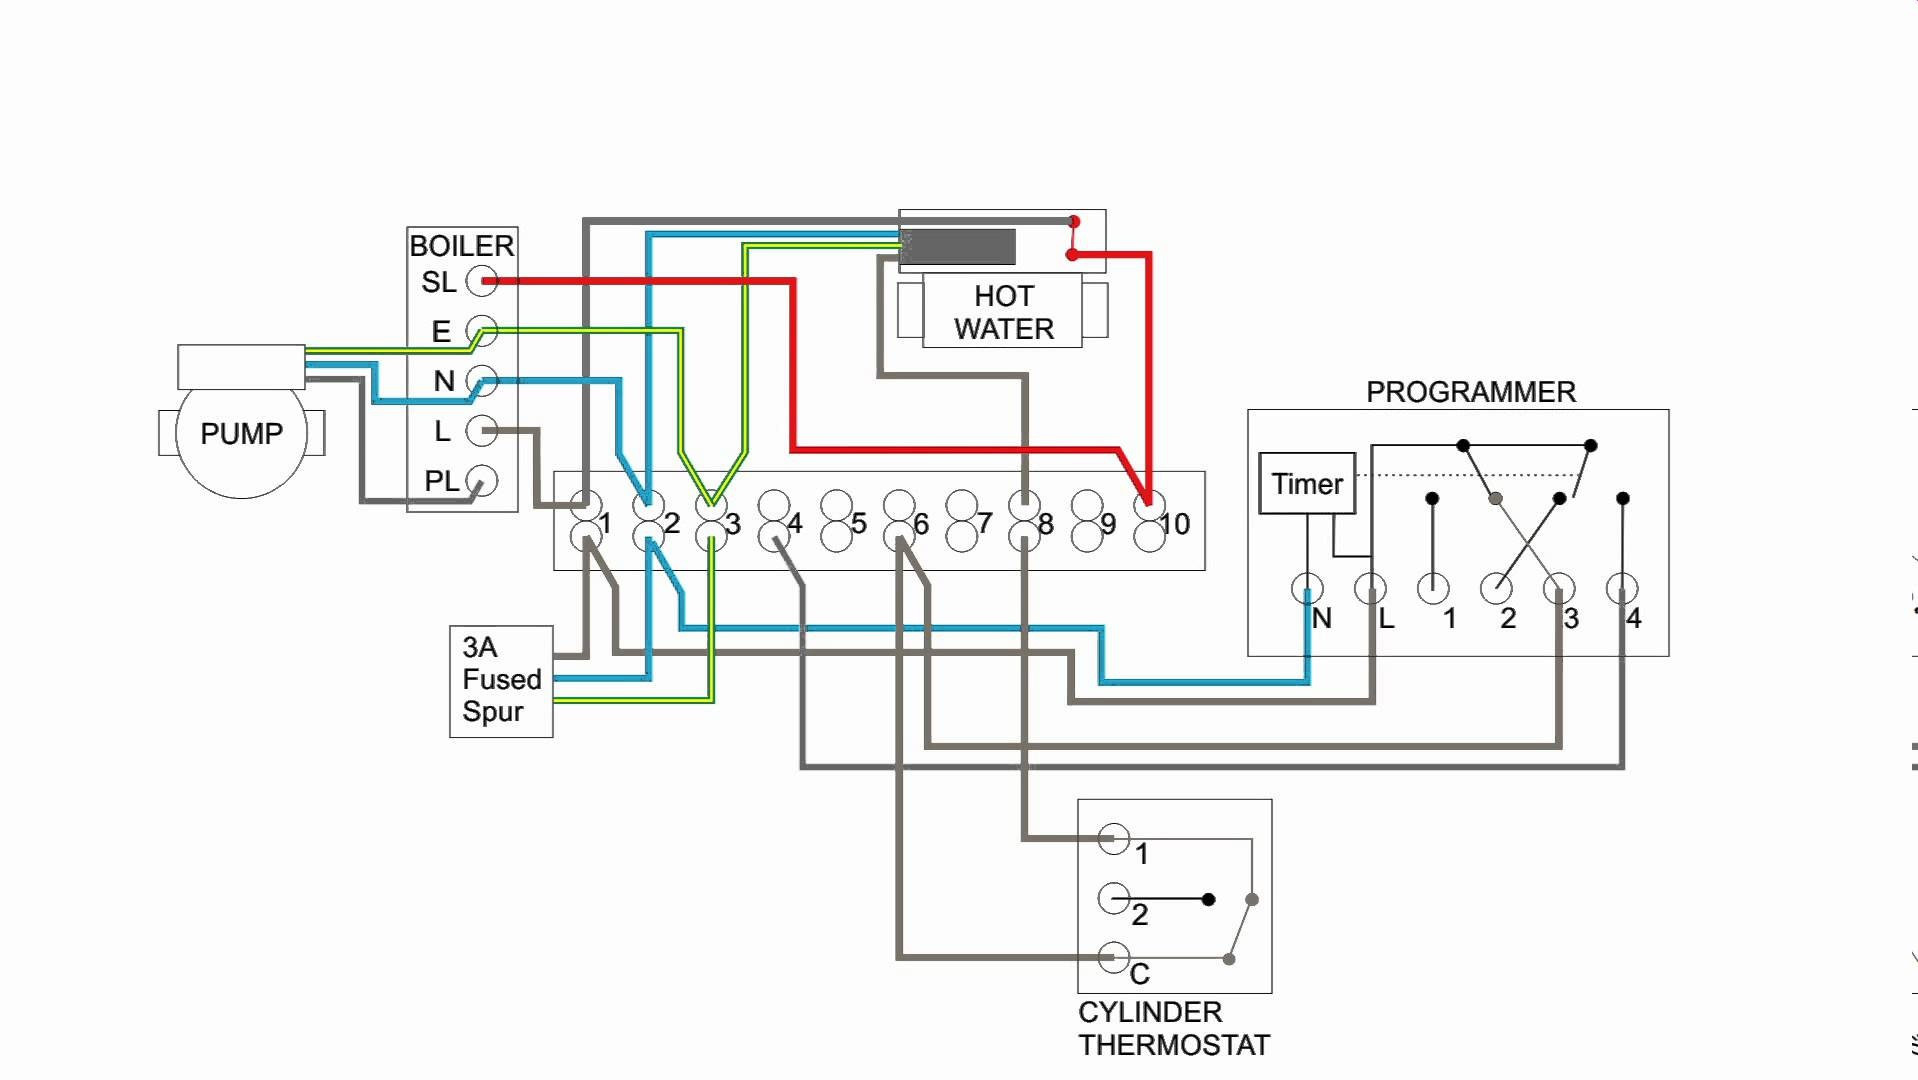 Hot Water Heating System Wiring Schematic   Switch Wiring Diagram - 5 Wire Thermostat Wiring Diagram